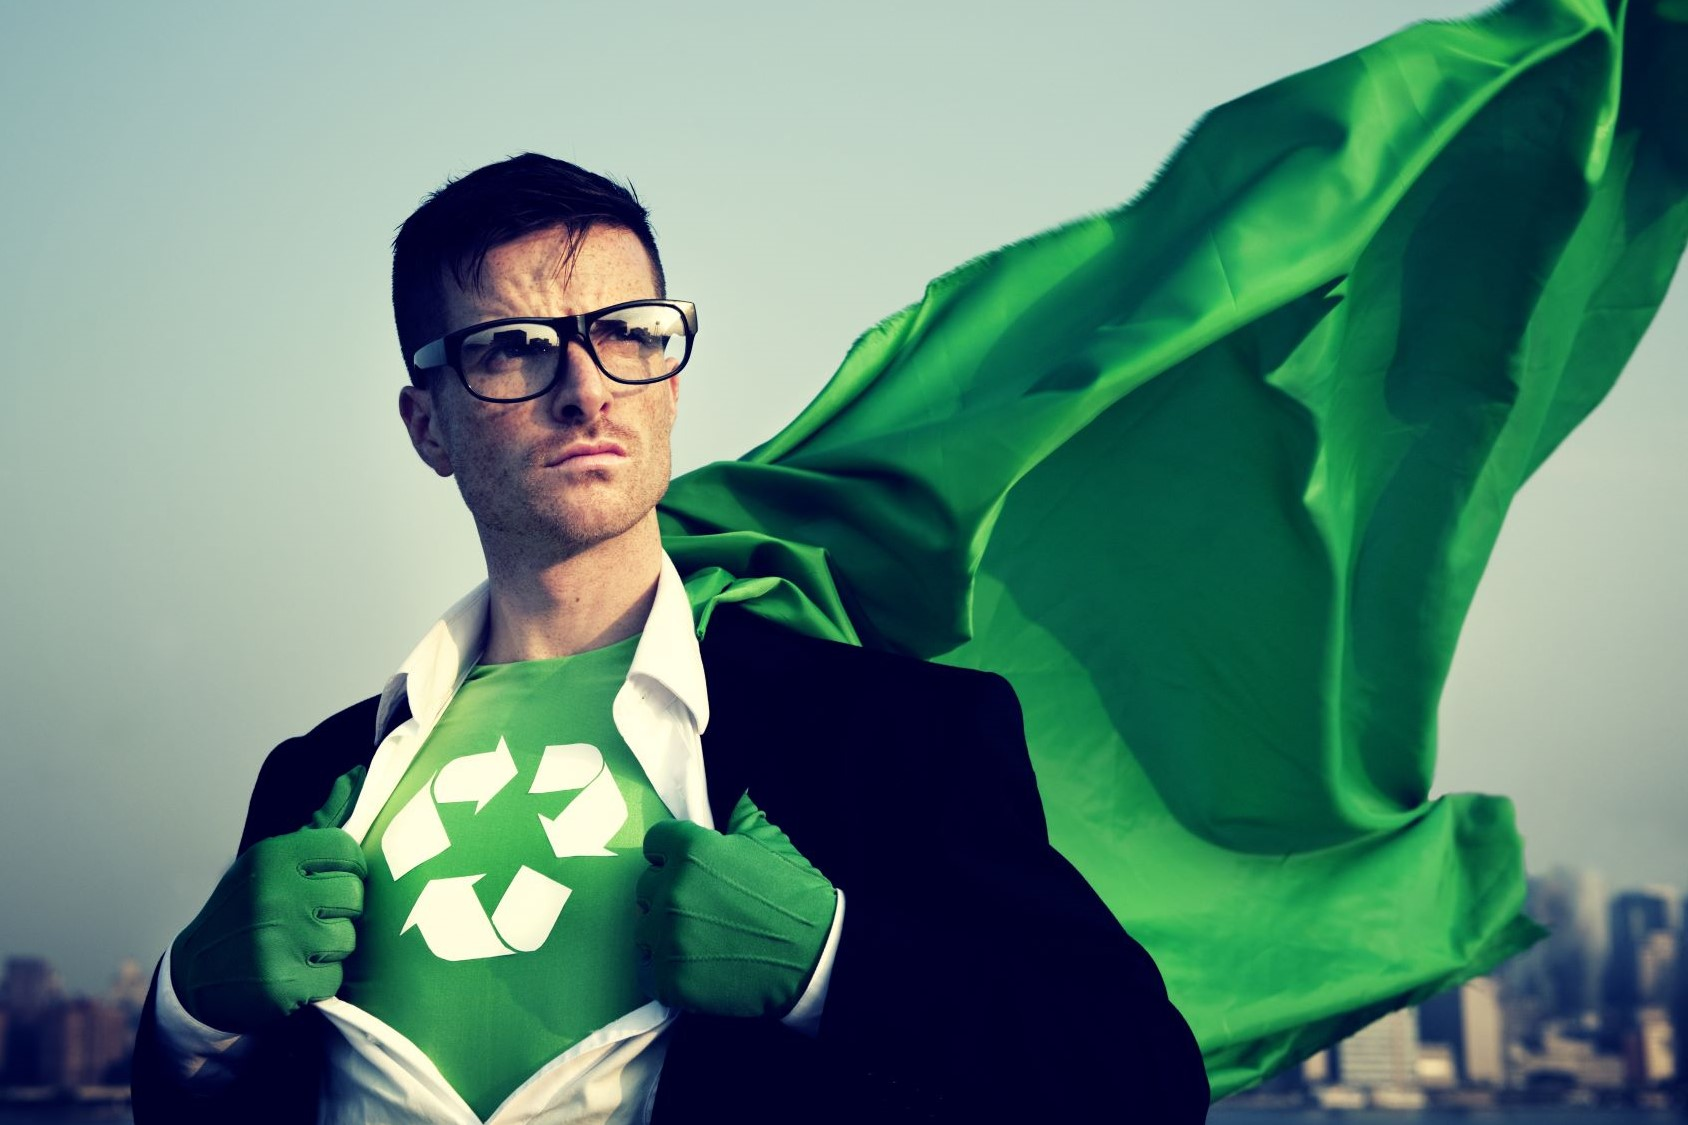 Atommüll-Recycling macht Endlager überflüssig